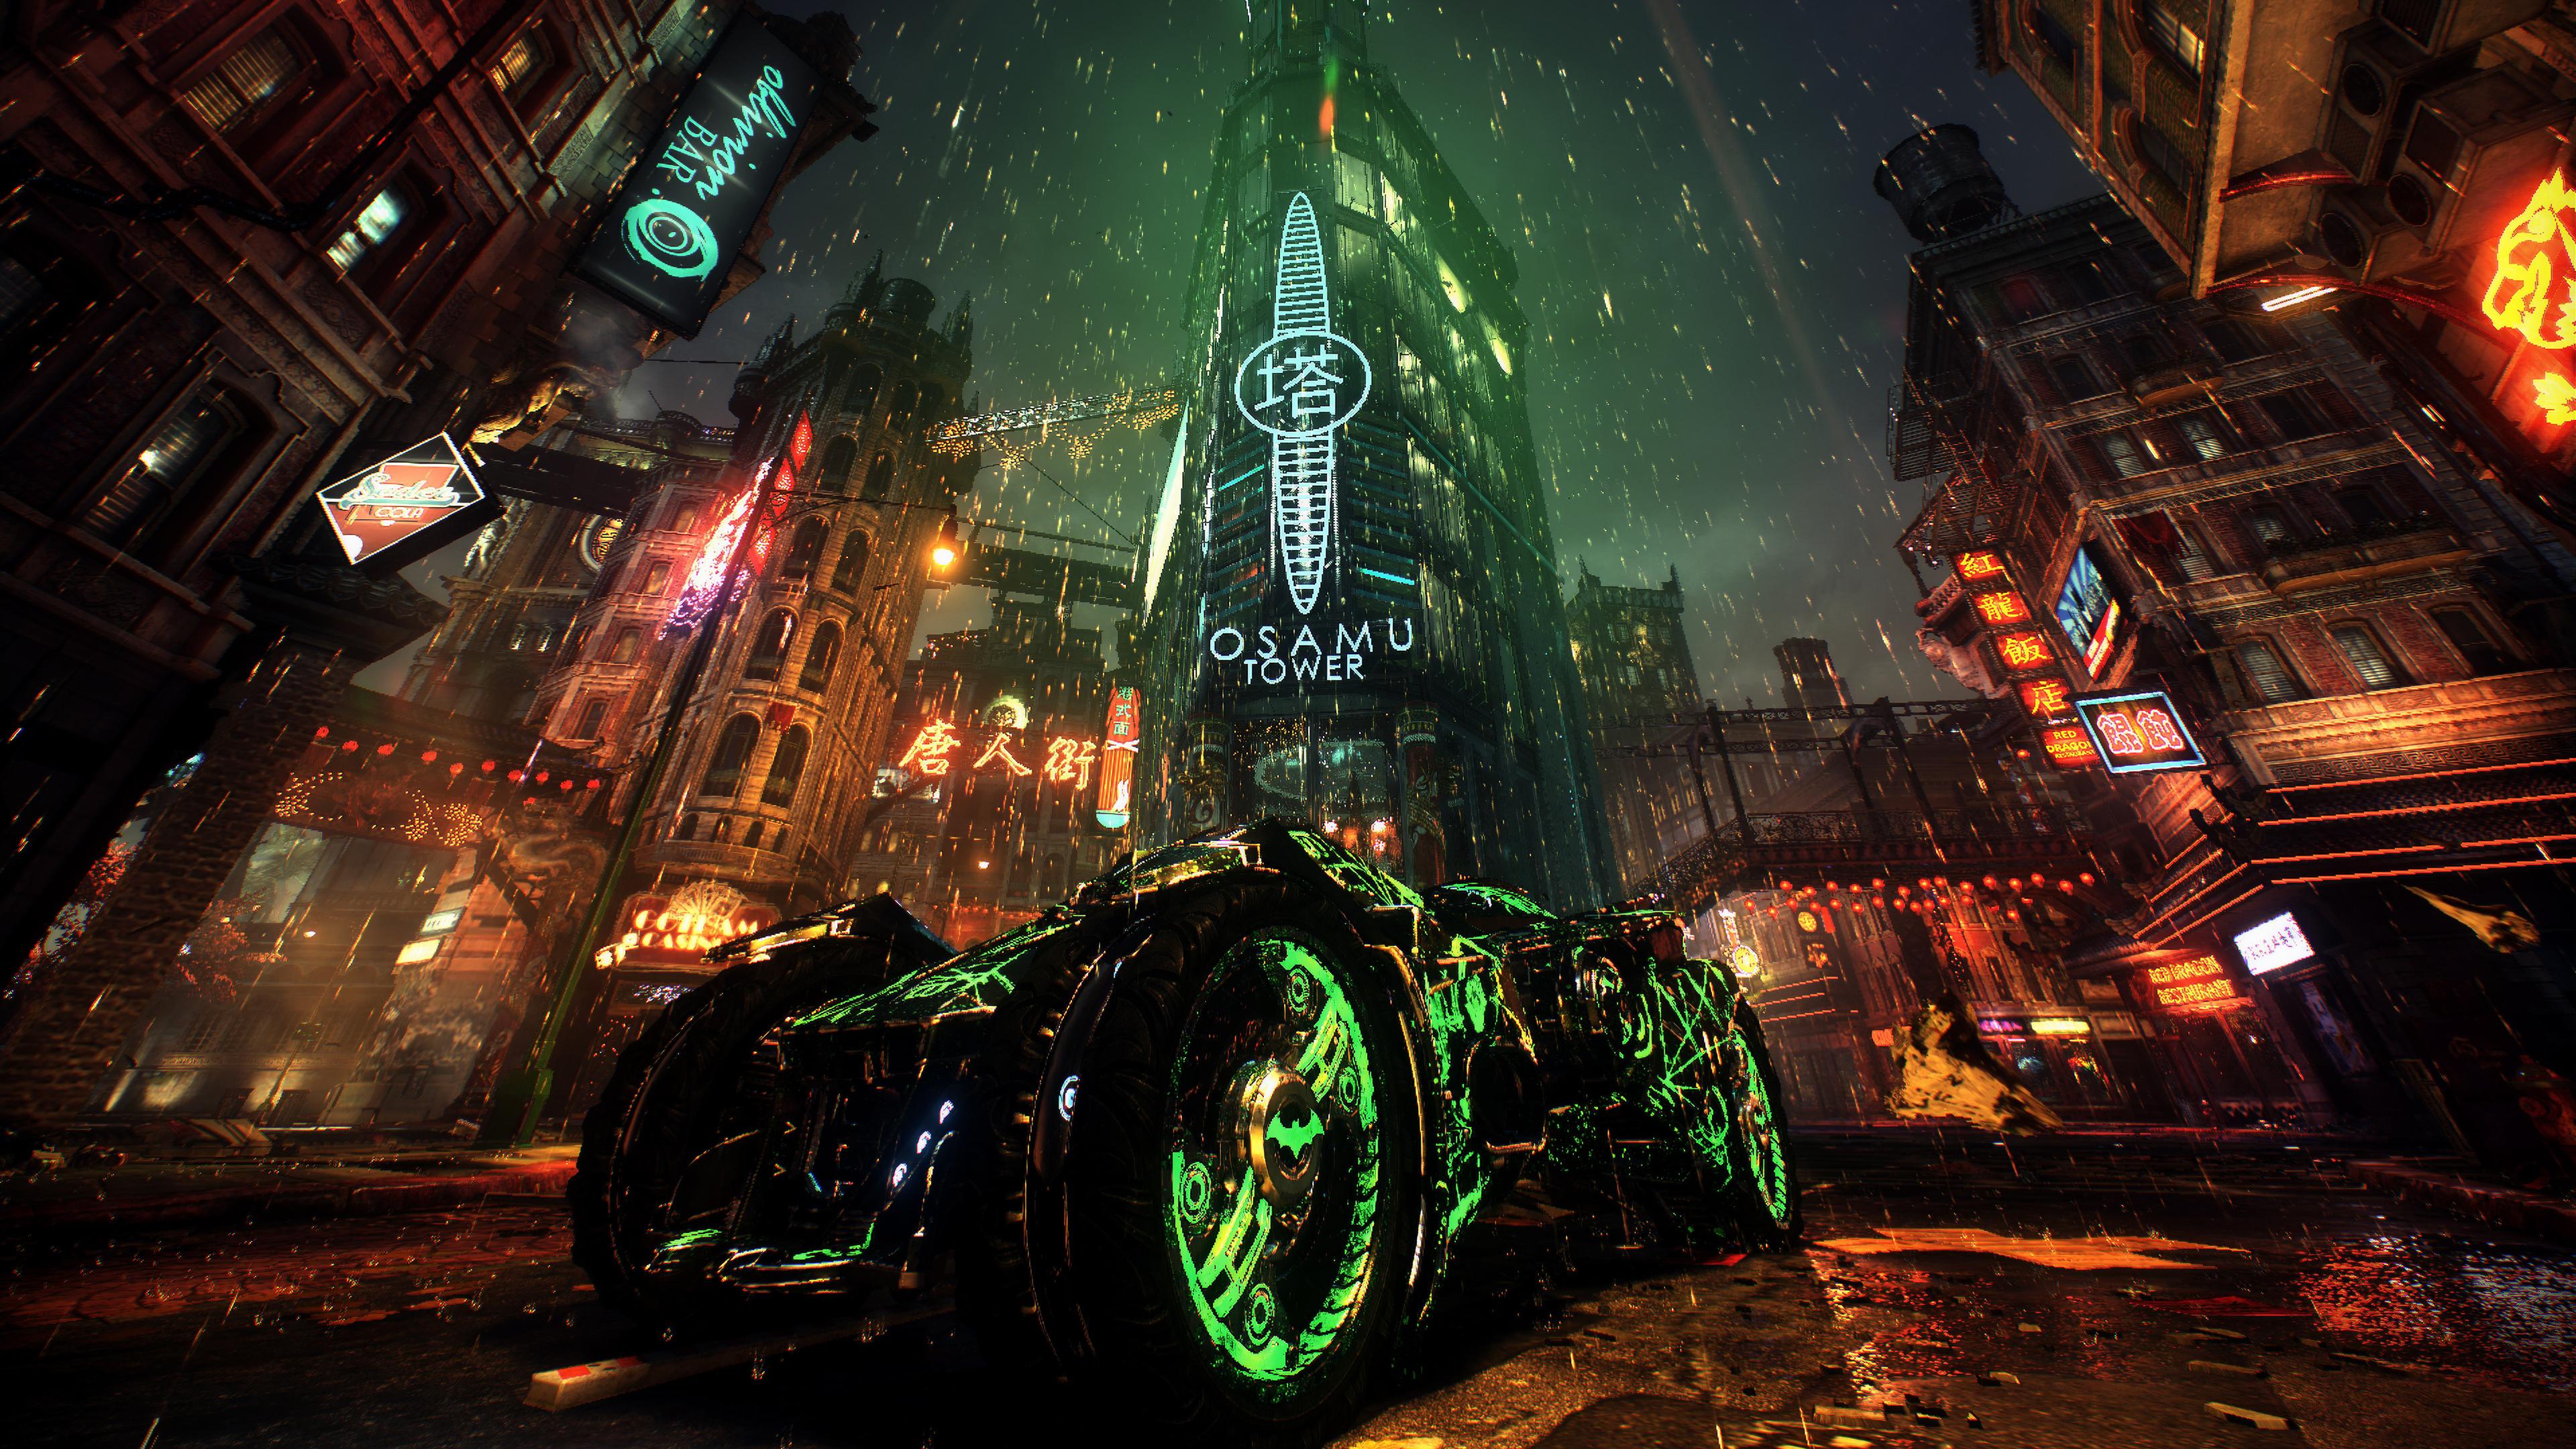 Batmobile Batman Arkham Knight 4k, HD Games, 4k Wallpapers ...